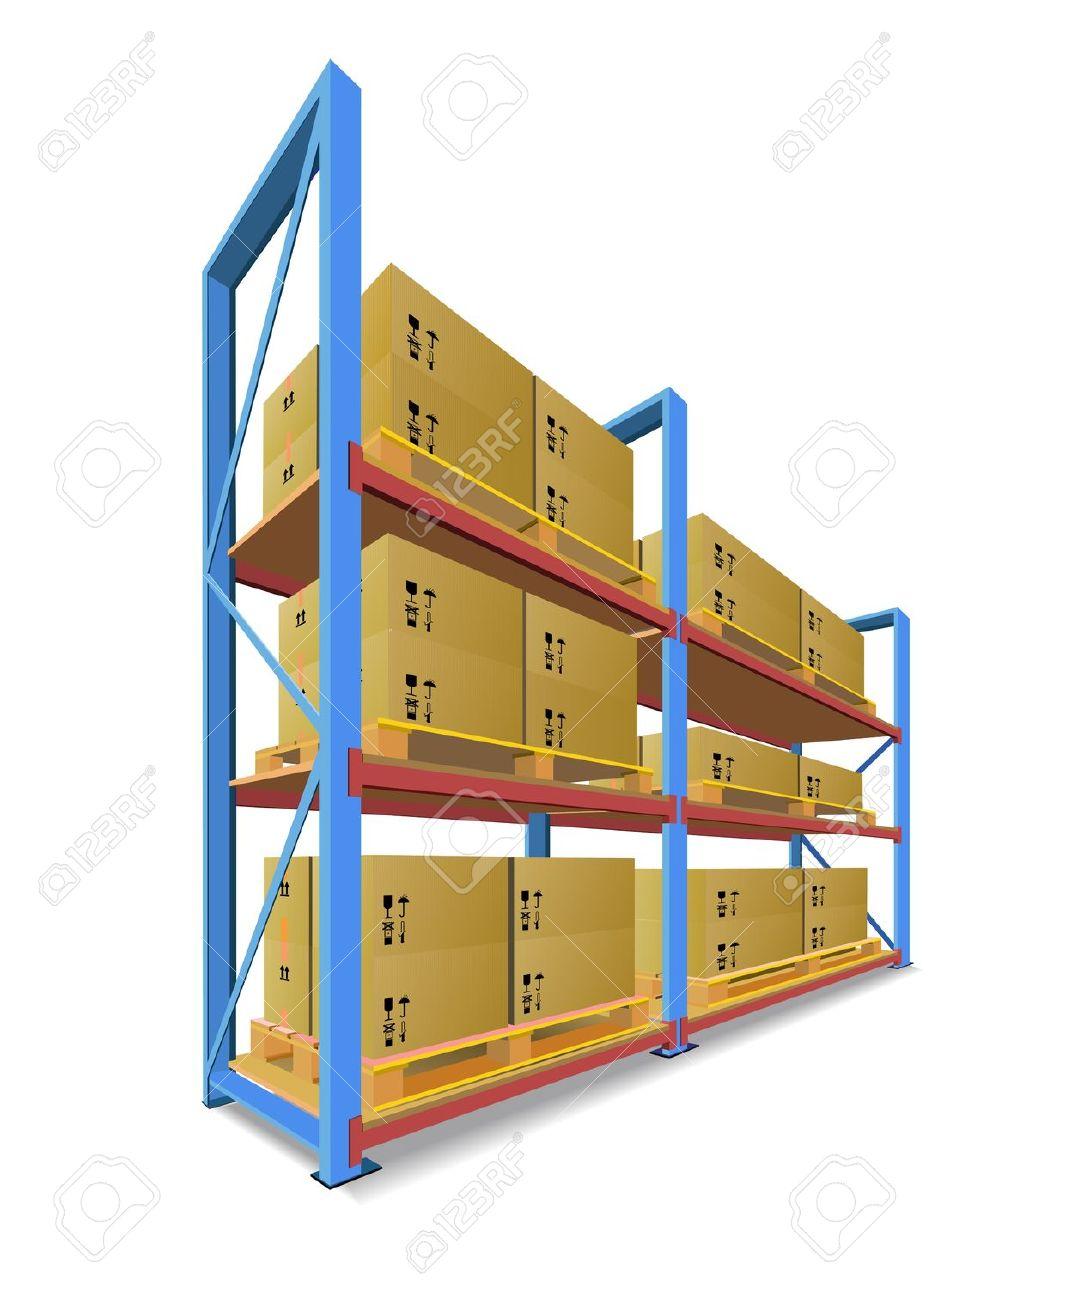 Warehouse clipart Shelf cliparts Clipart Warehouse Warehouse